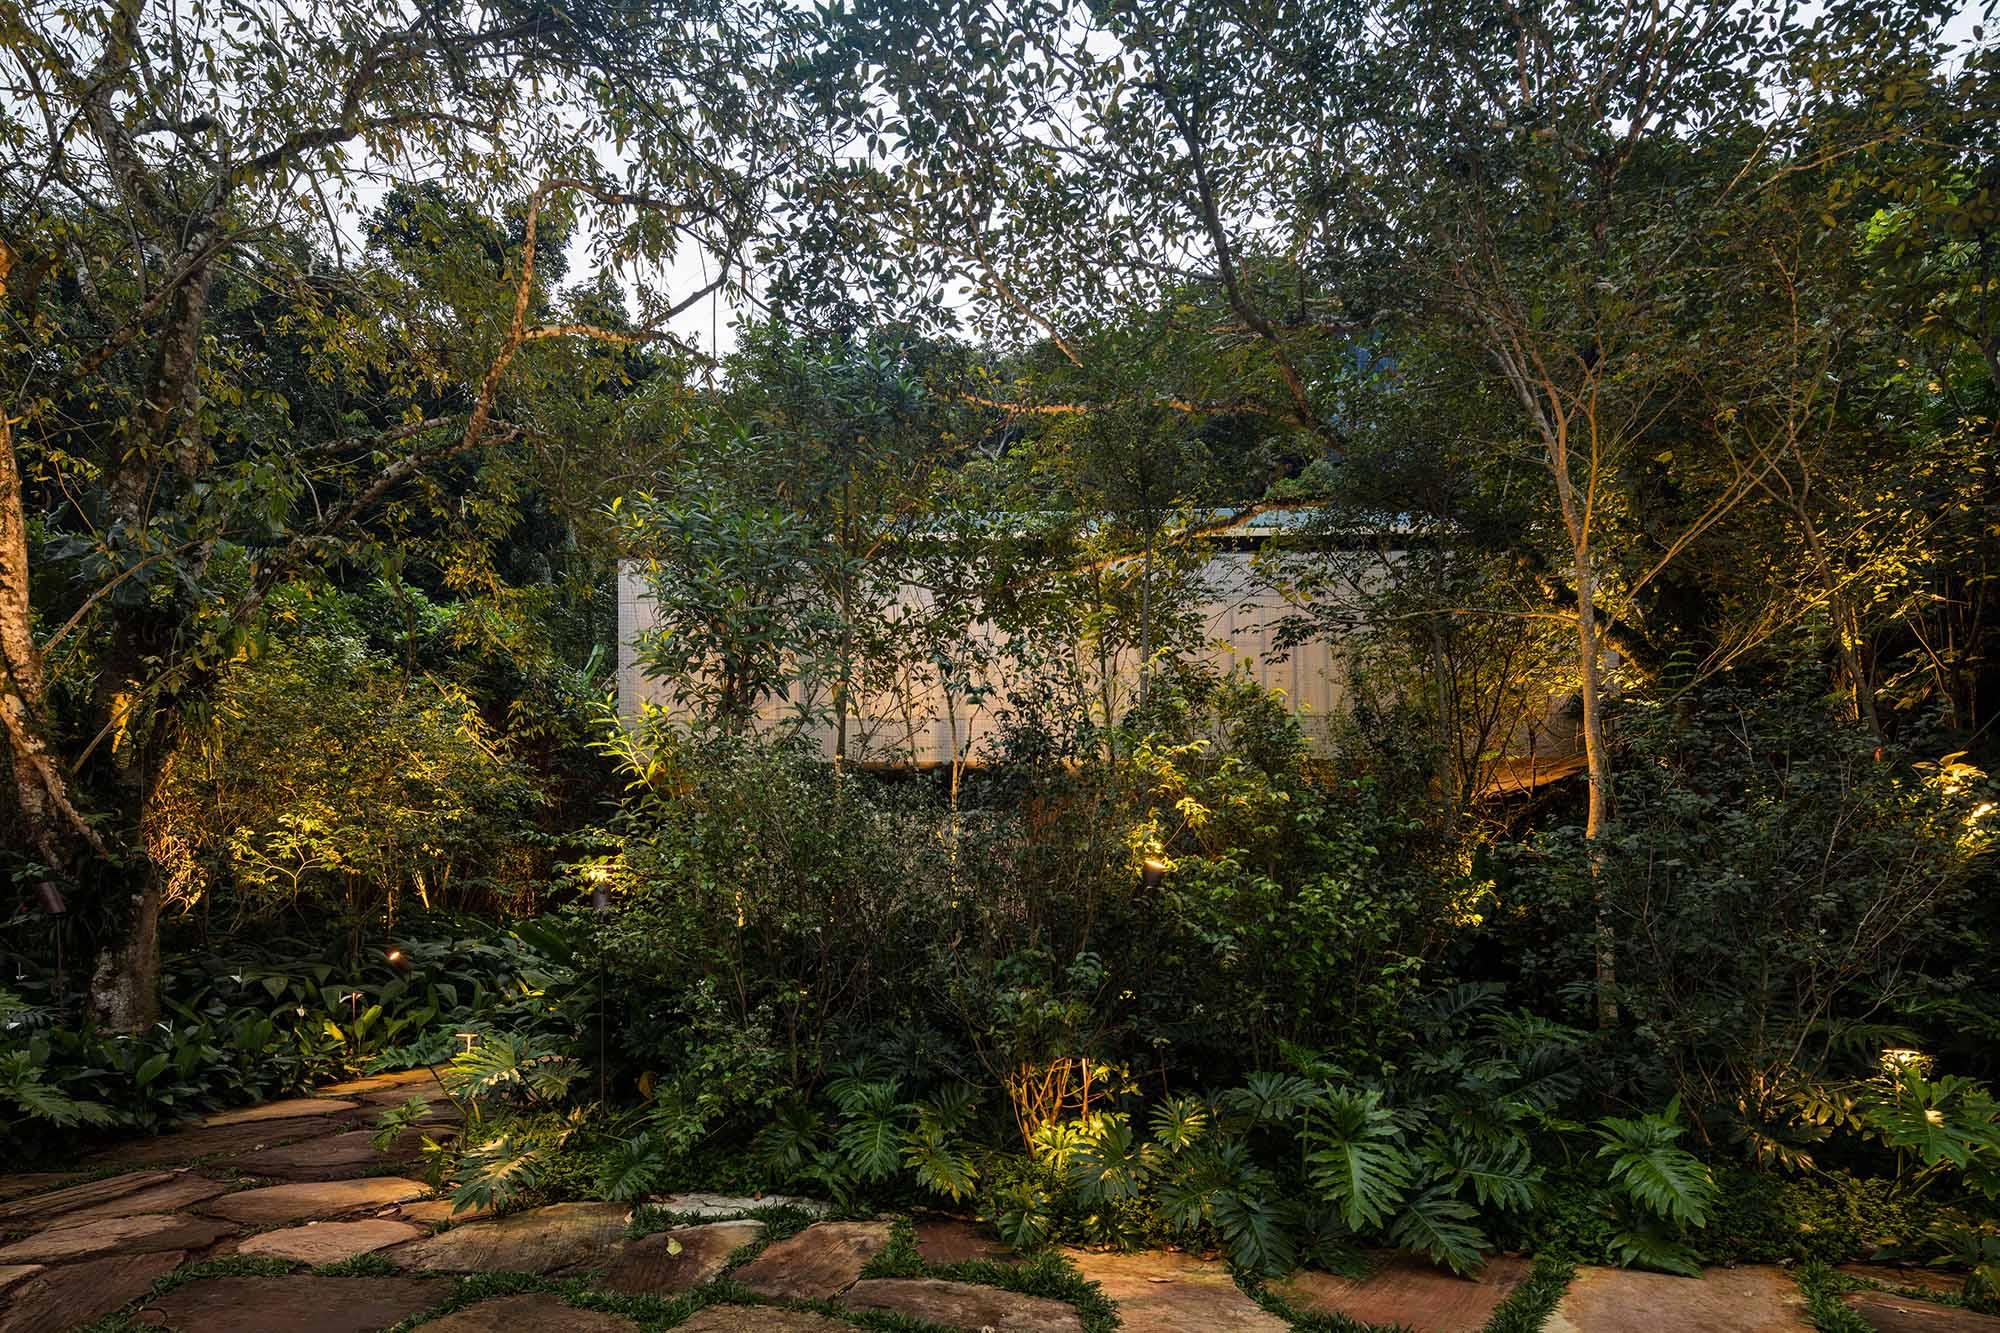 H-House-Life-Jungle-House-Casa-Da-Mata-studio-mk27-mk27_namata_fernandoguerra_medium(46).JPG